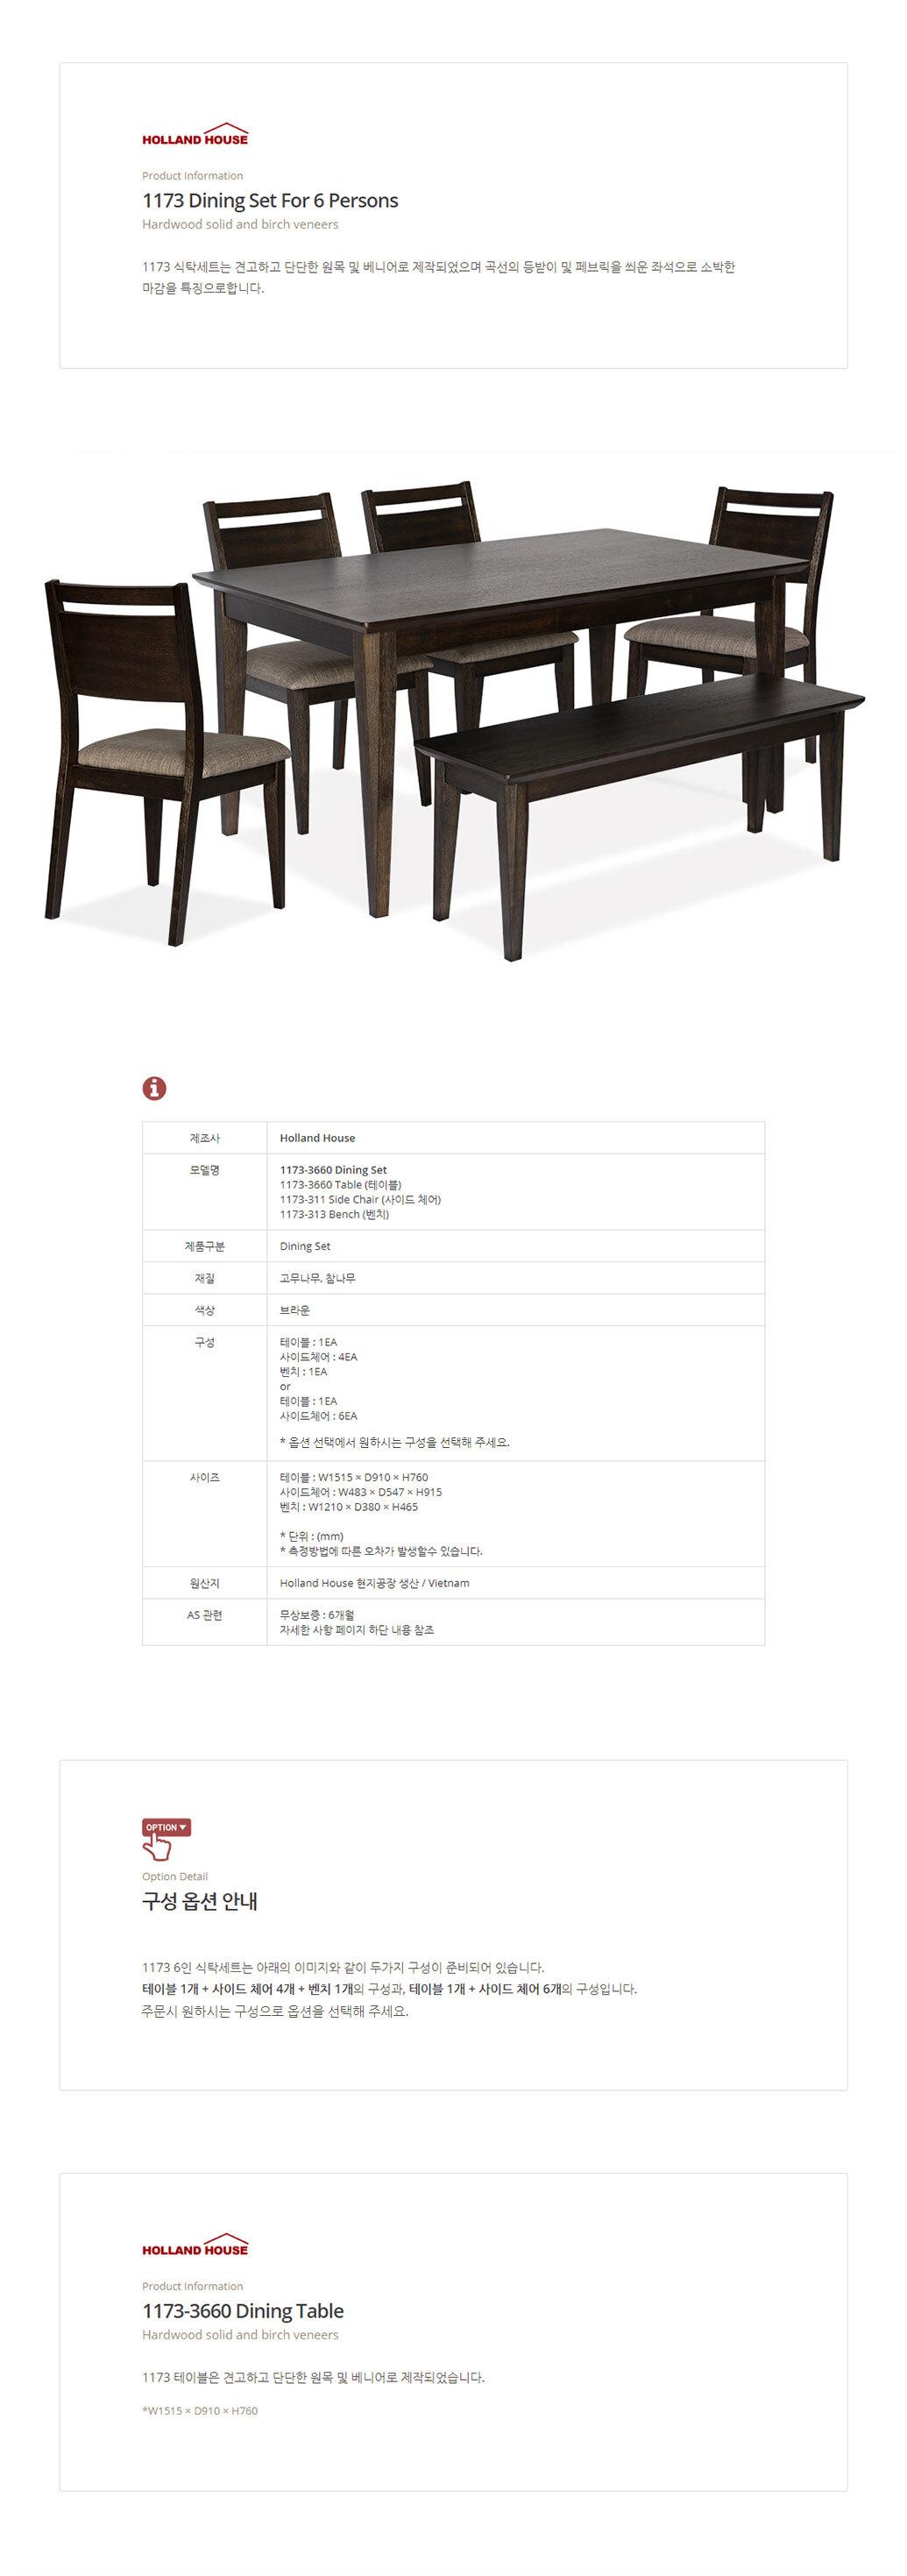 1173_dining_table_01.jpg